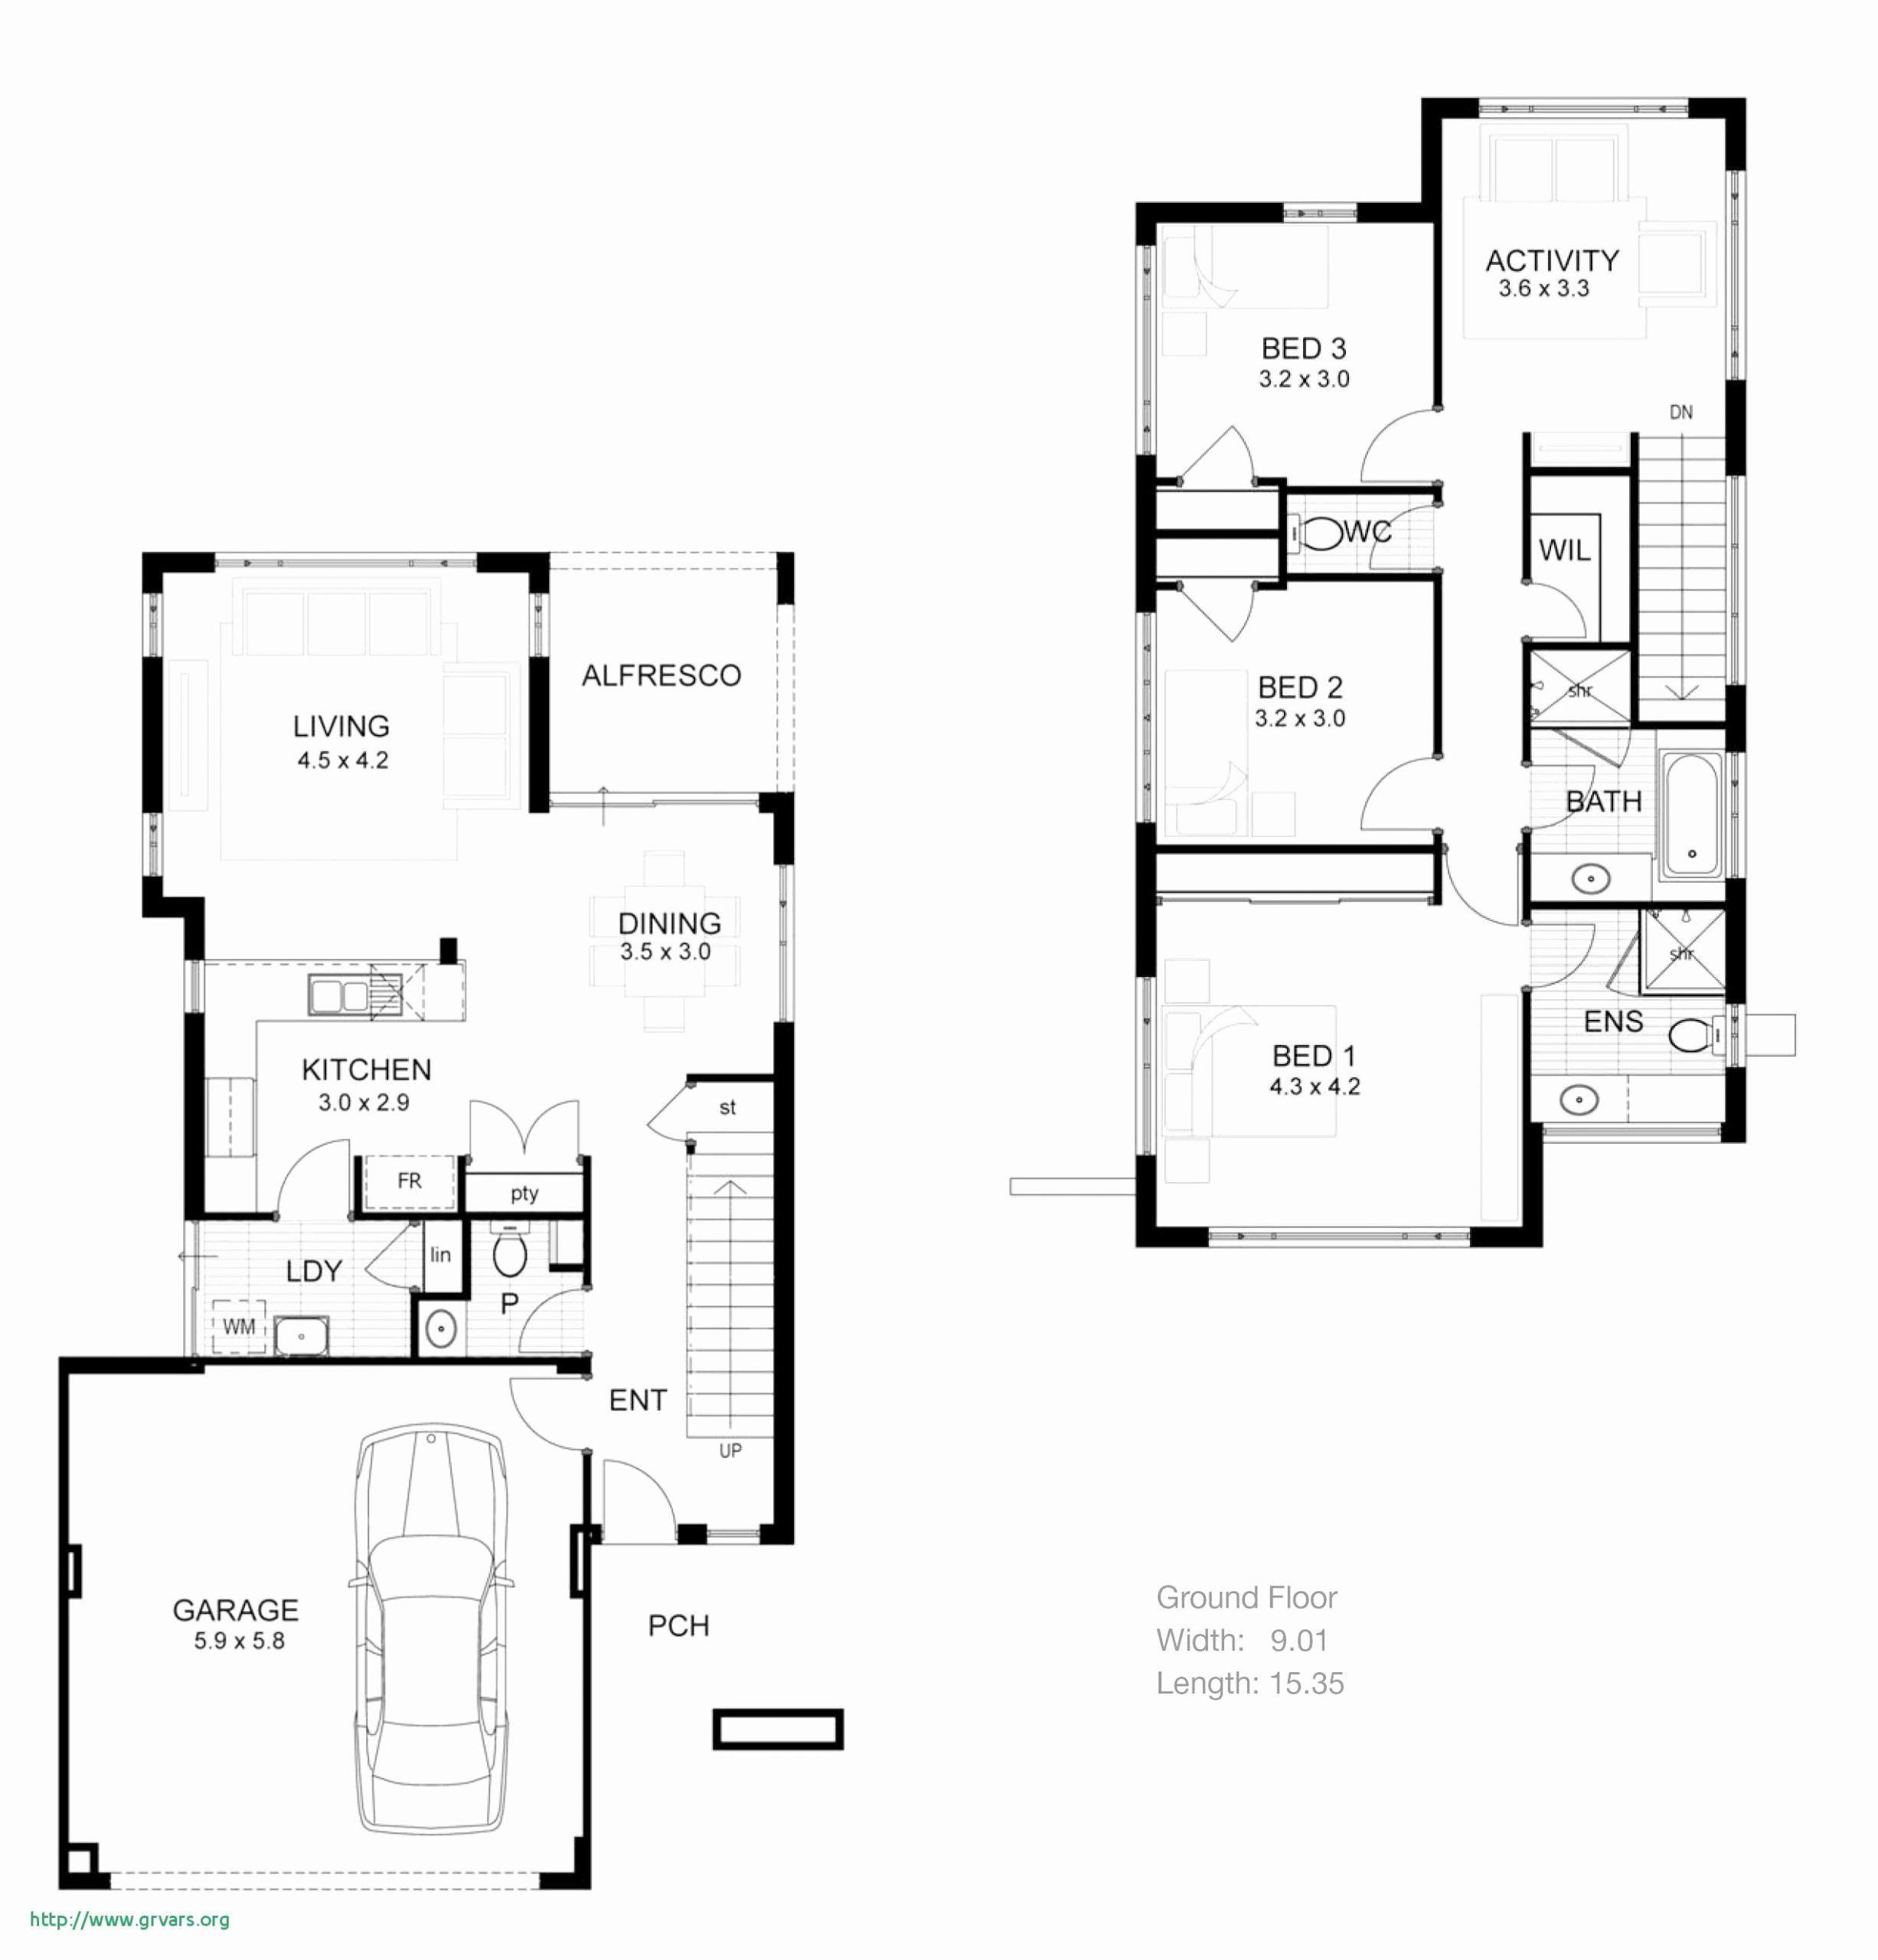 8 Nice Basement Floor Plans Hardwood Flooring Hilo Hawaii Of 18 Meilleur De Floors Of Hawaii House Plans Uk Home Design Floor Plans Mansion Floor Plan